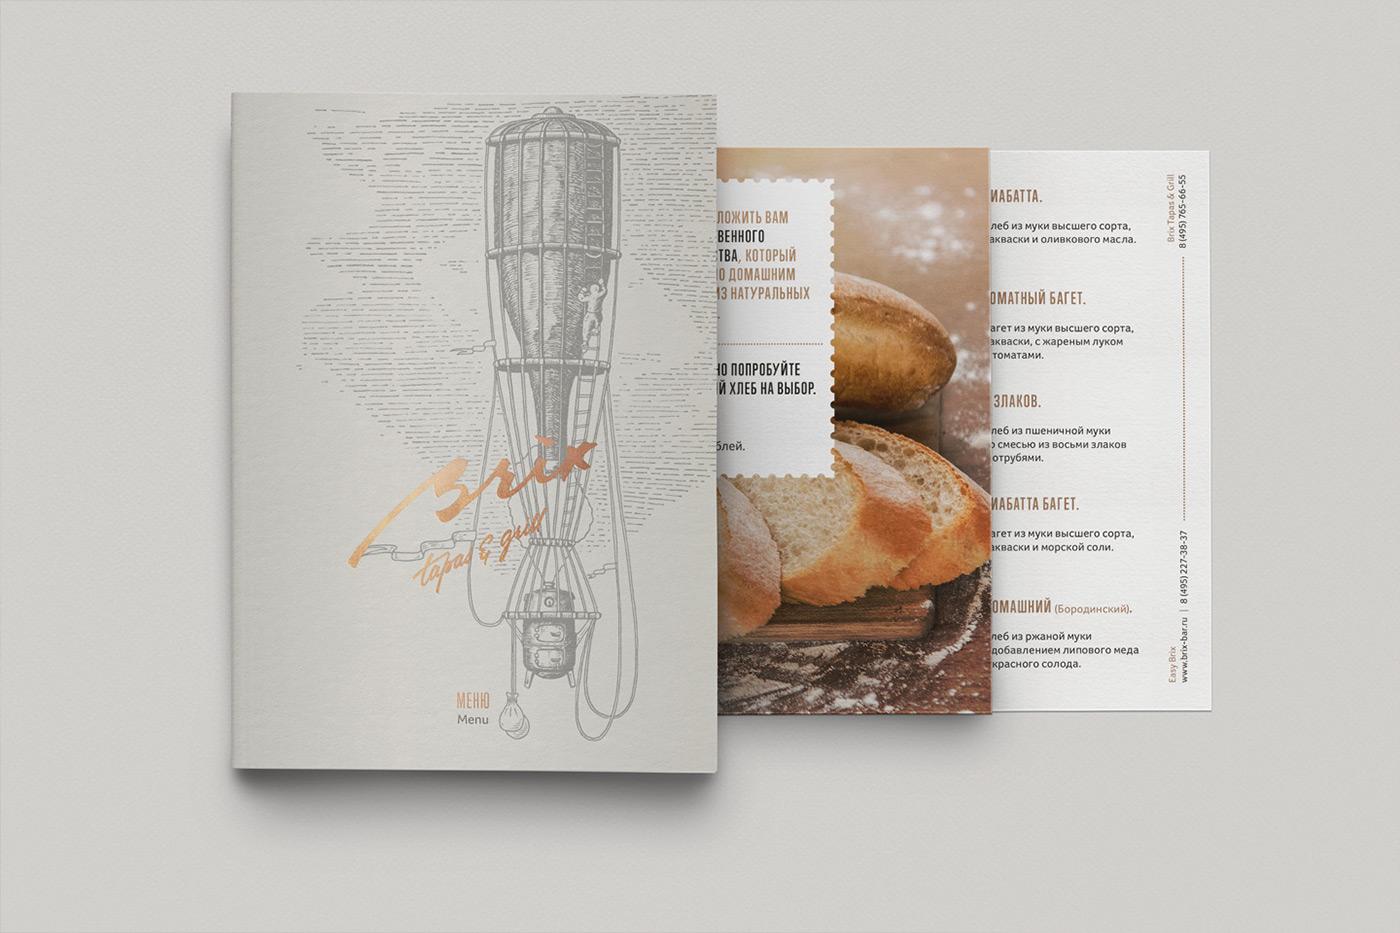 Brix tapas & grill 品牌视觉VI形象设计-深圳VI设计7